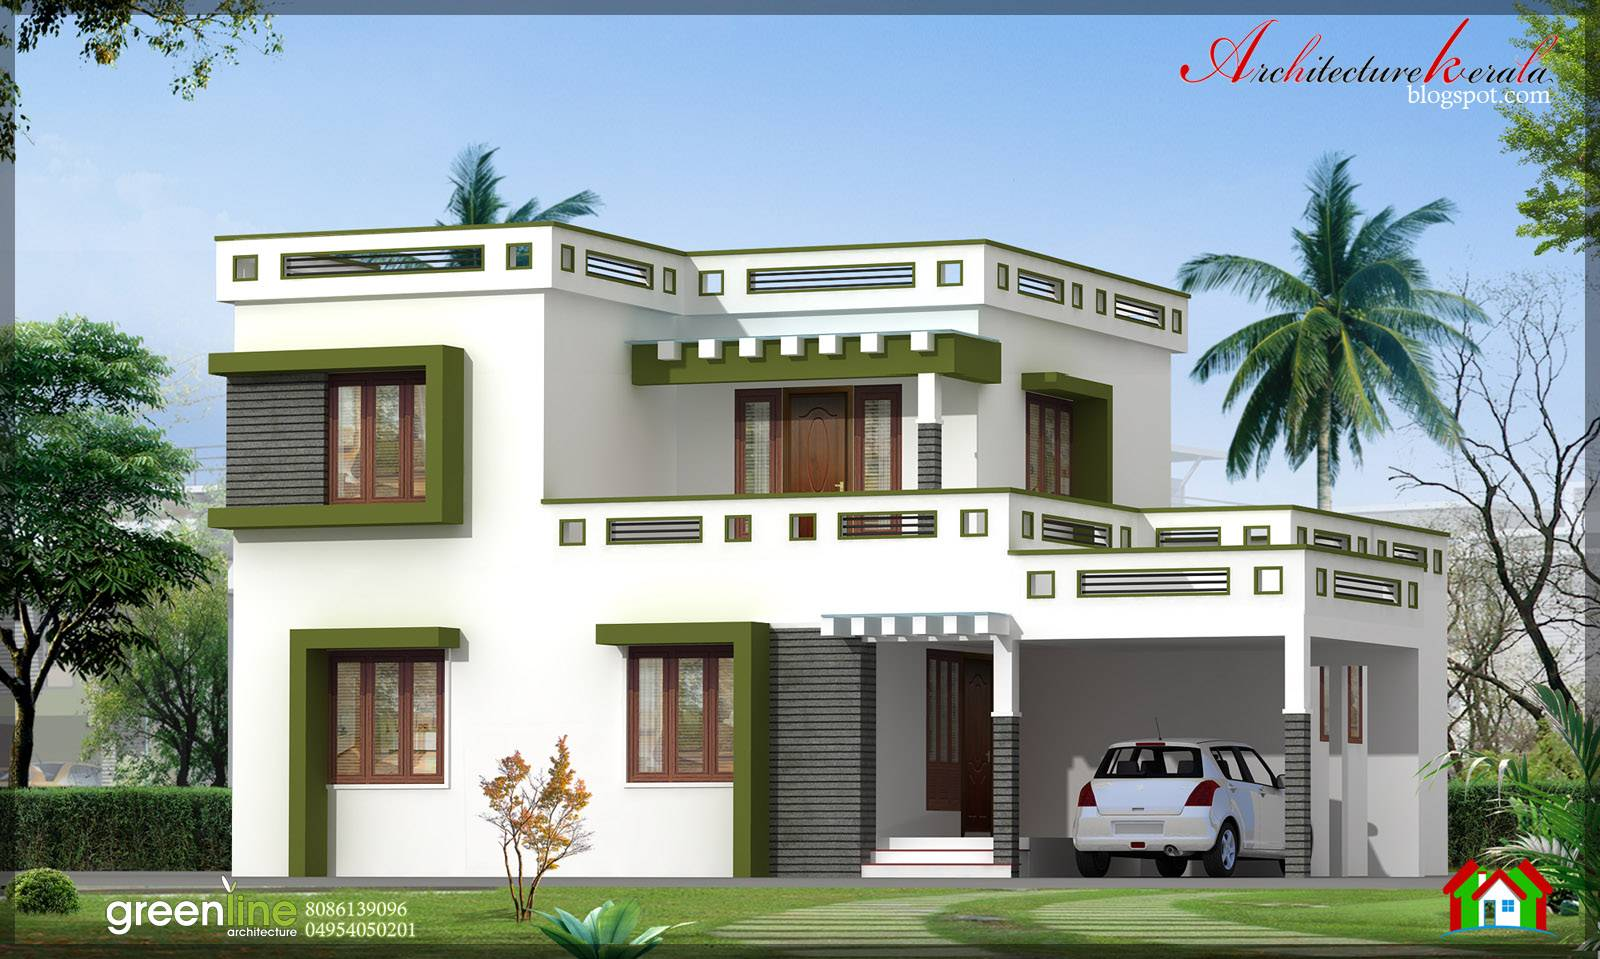 Nice Design Kerala Home House Plans 77341,Cross Country Shirt Designs